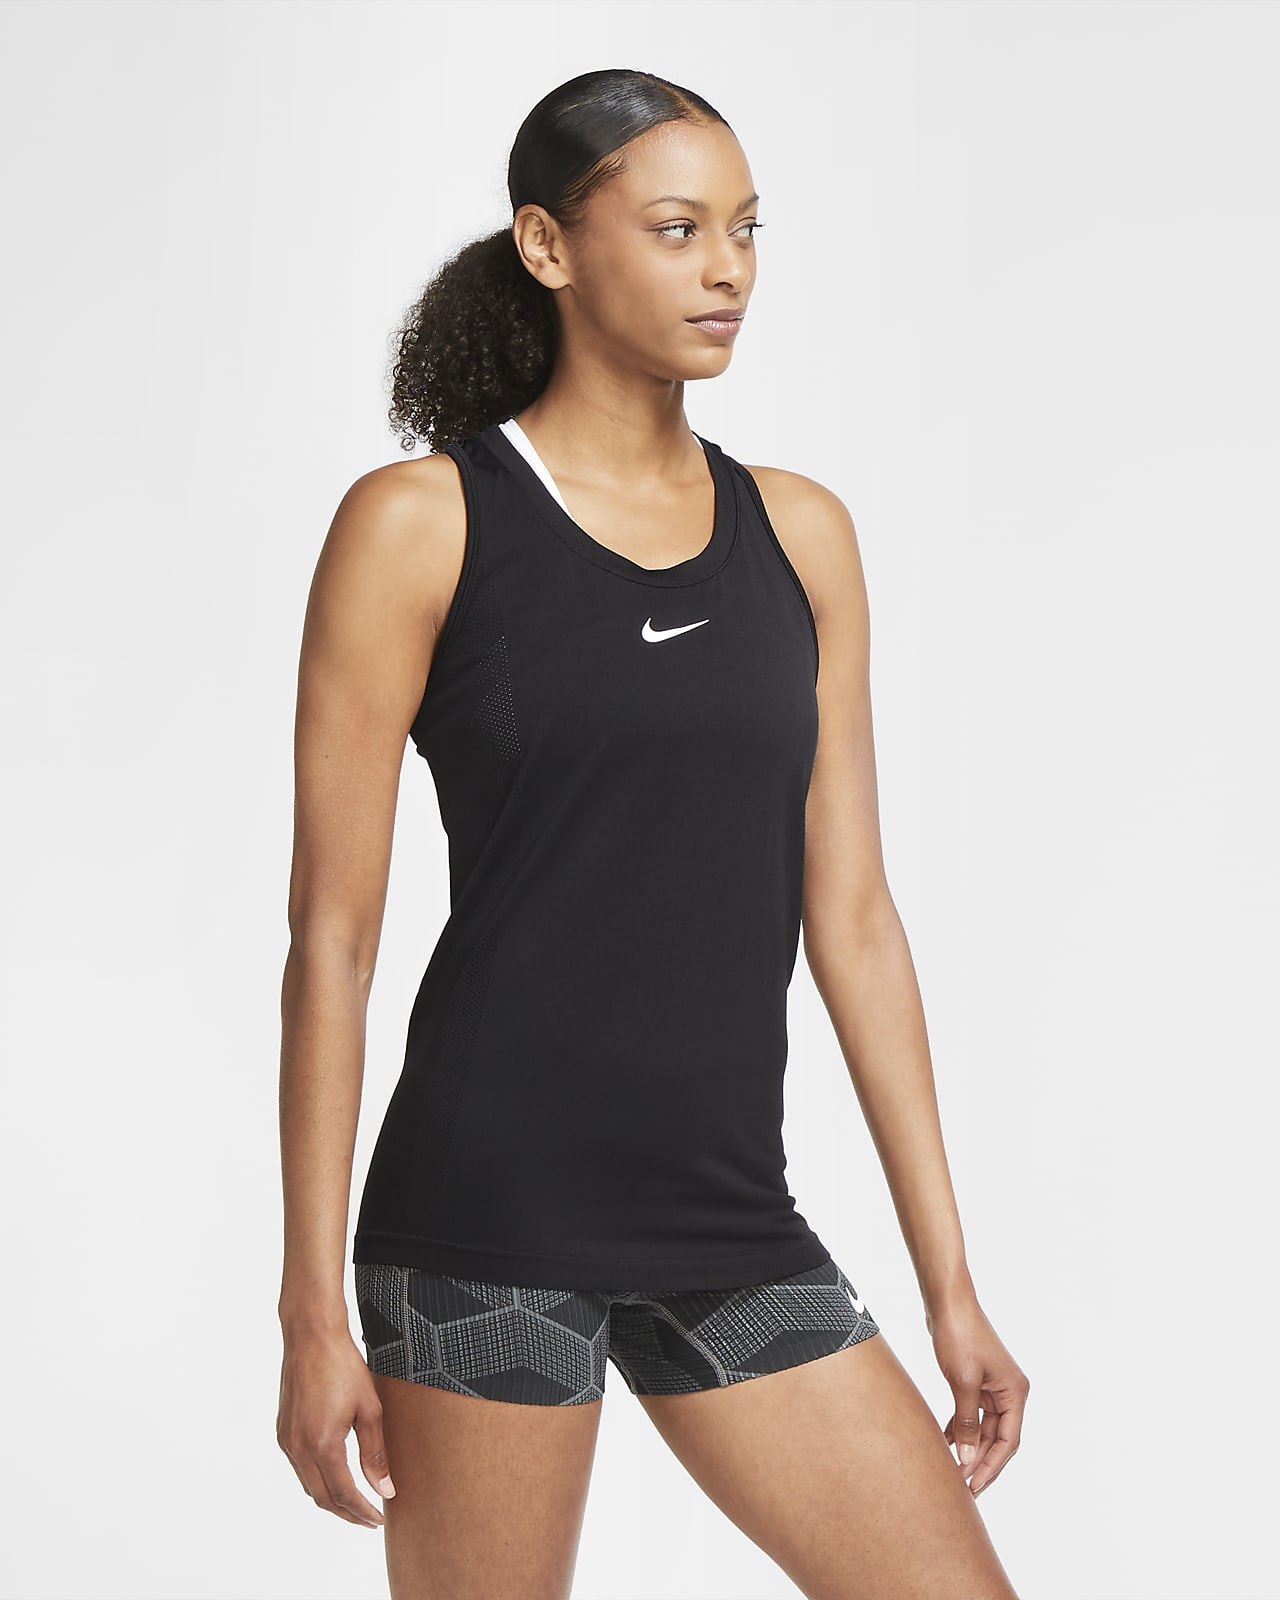 Camisola de running sem mangas Nike Infinite para mulher